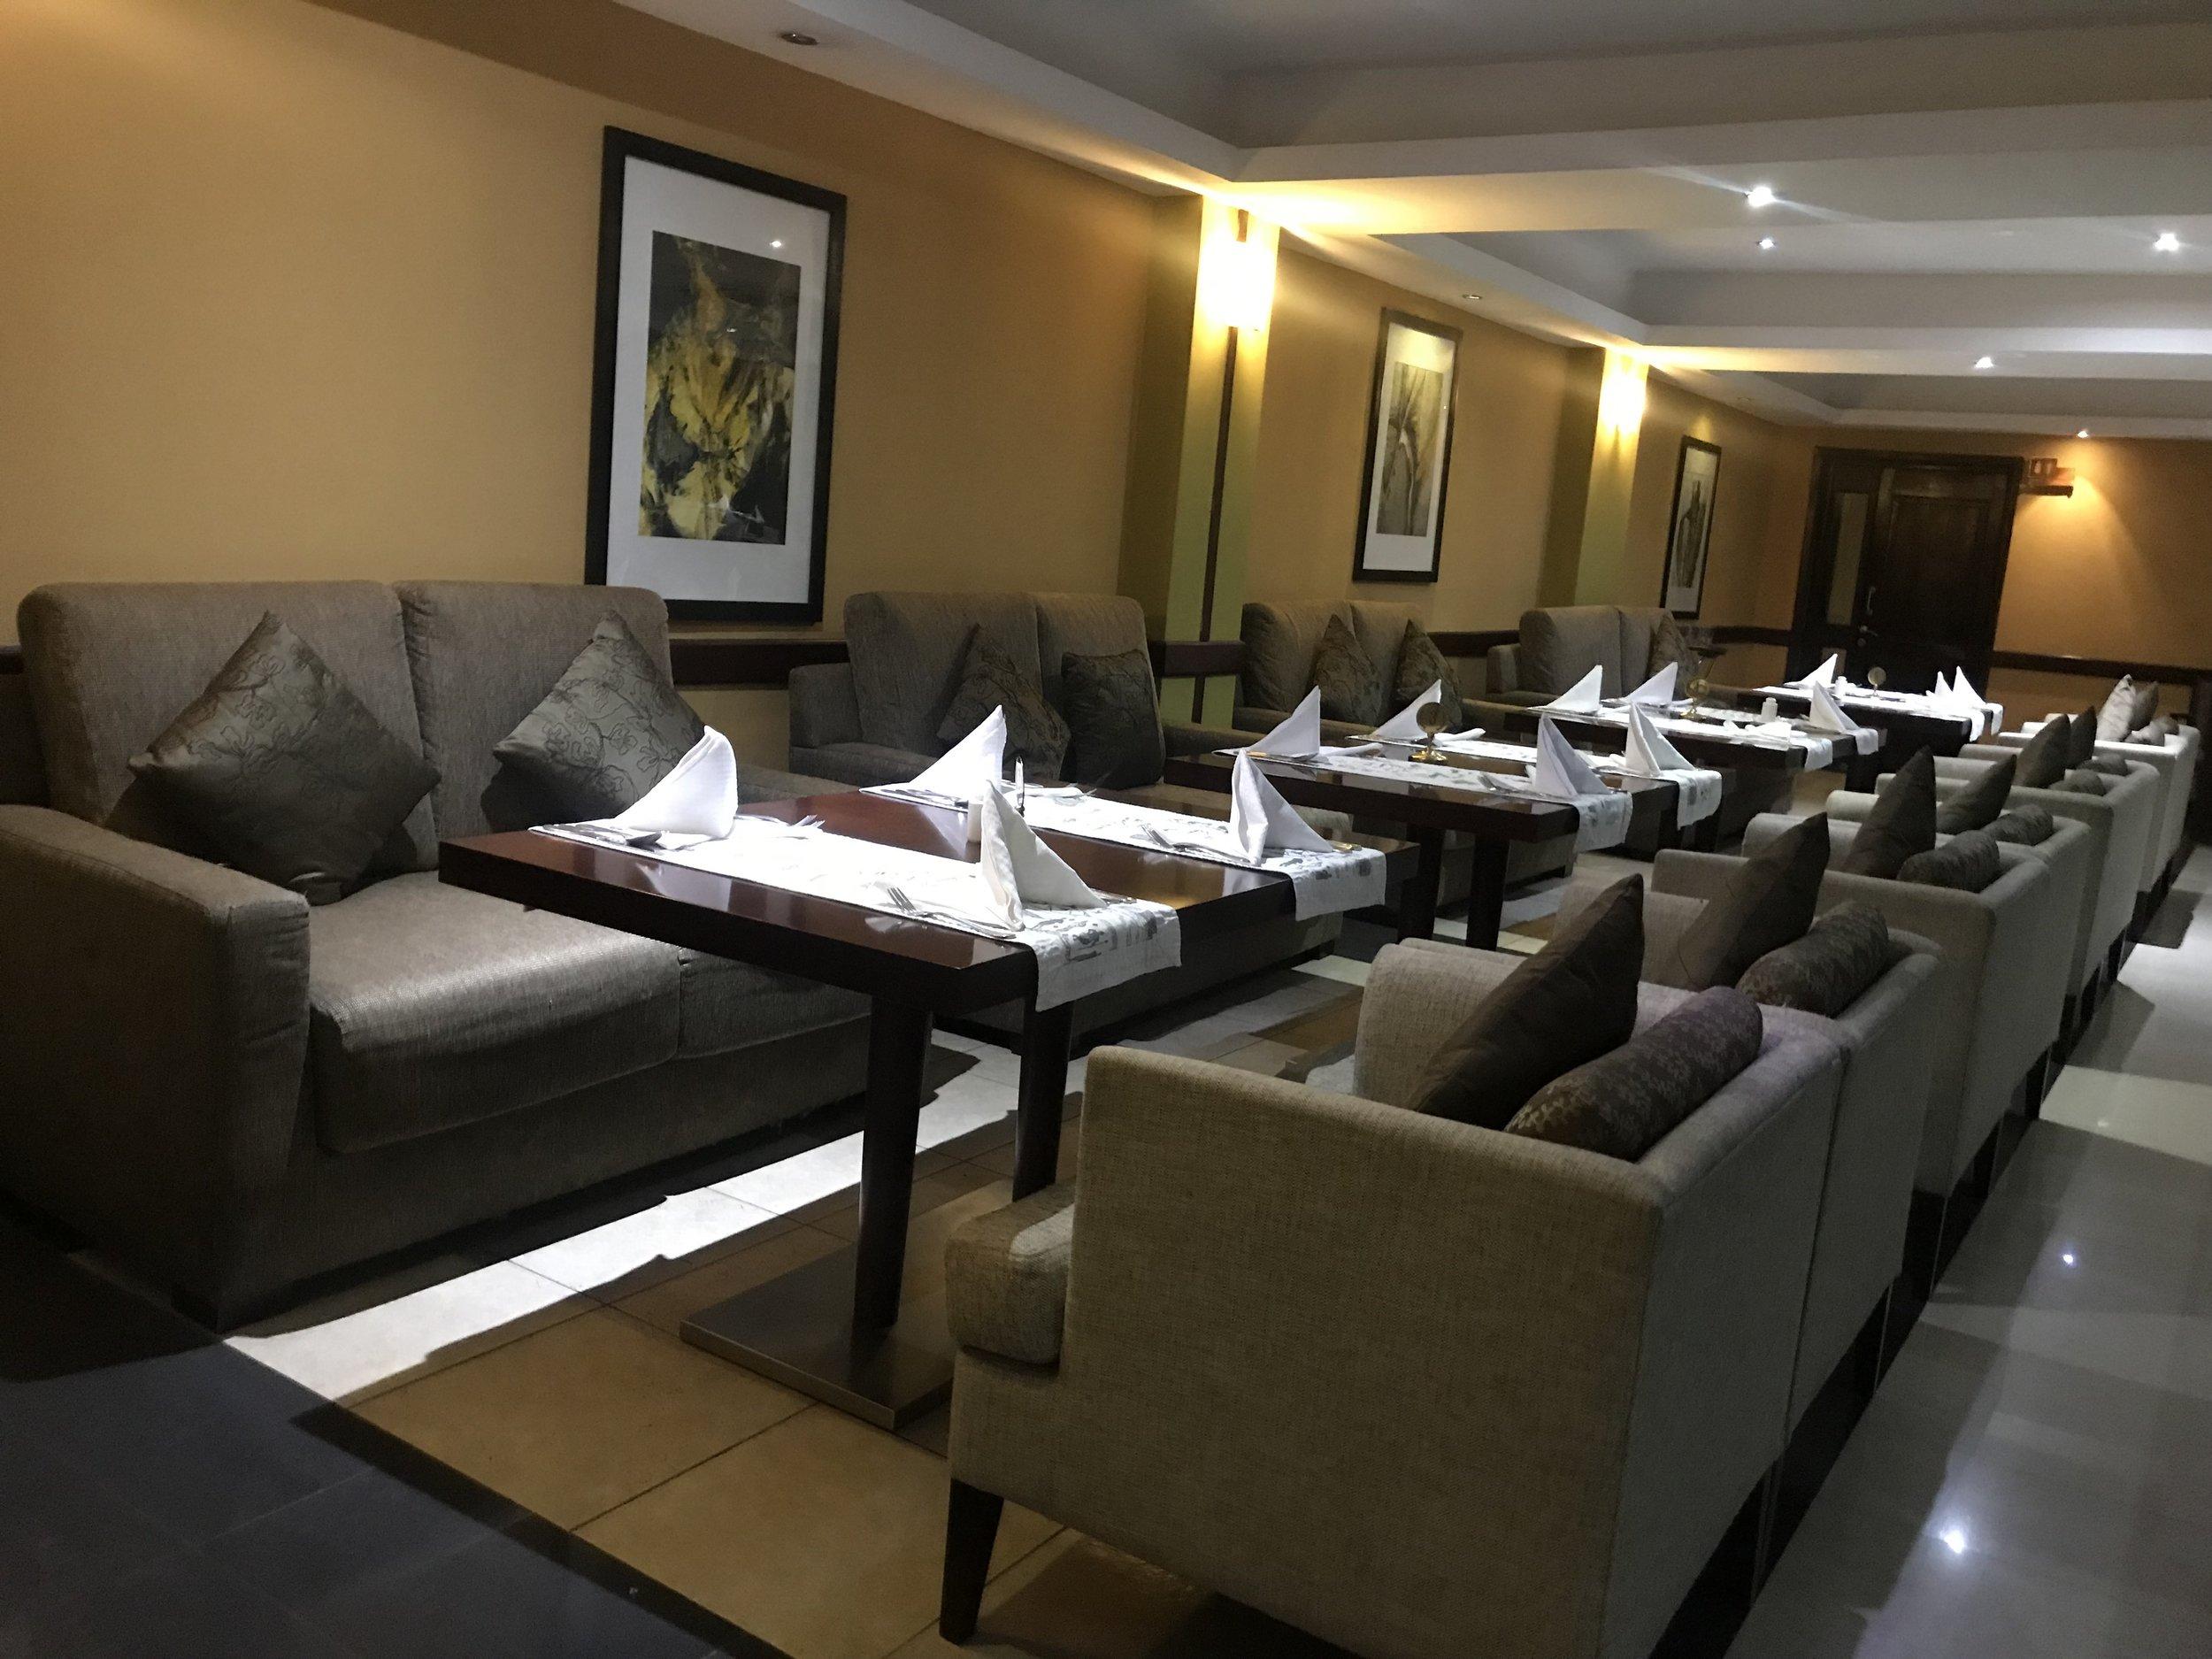 IMG_6251 2VickieRemoe-travel-kigali-rwanda-review-kwibohora25-hotels-africa.JPG